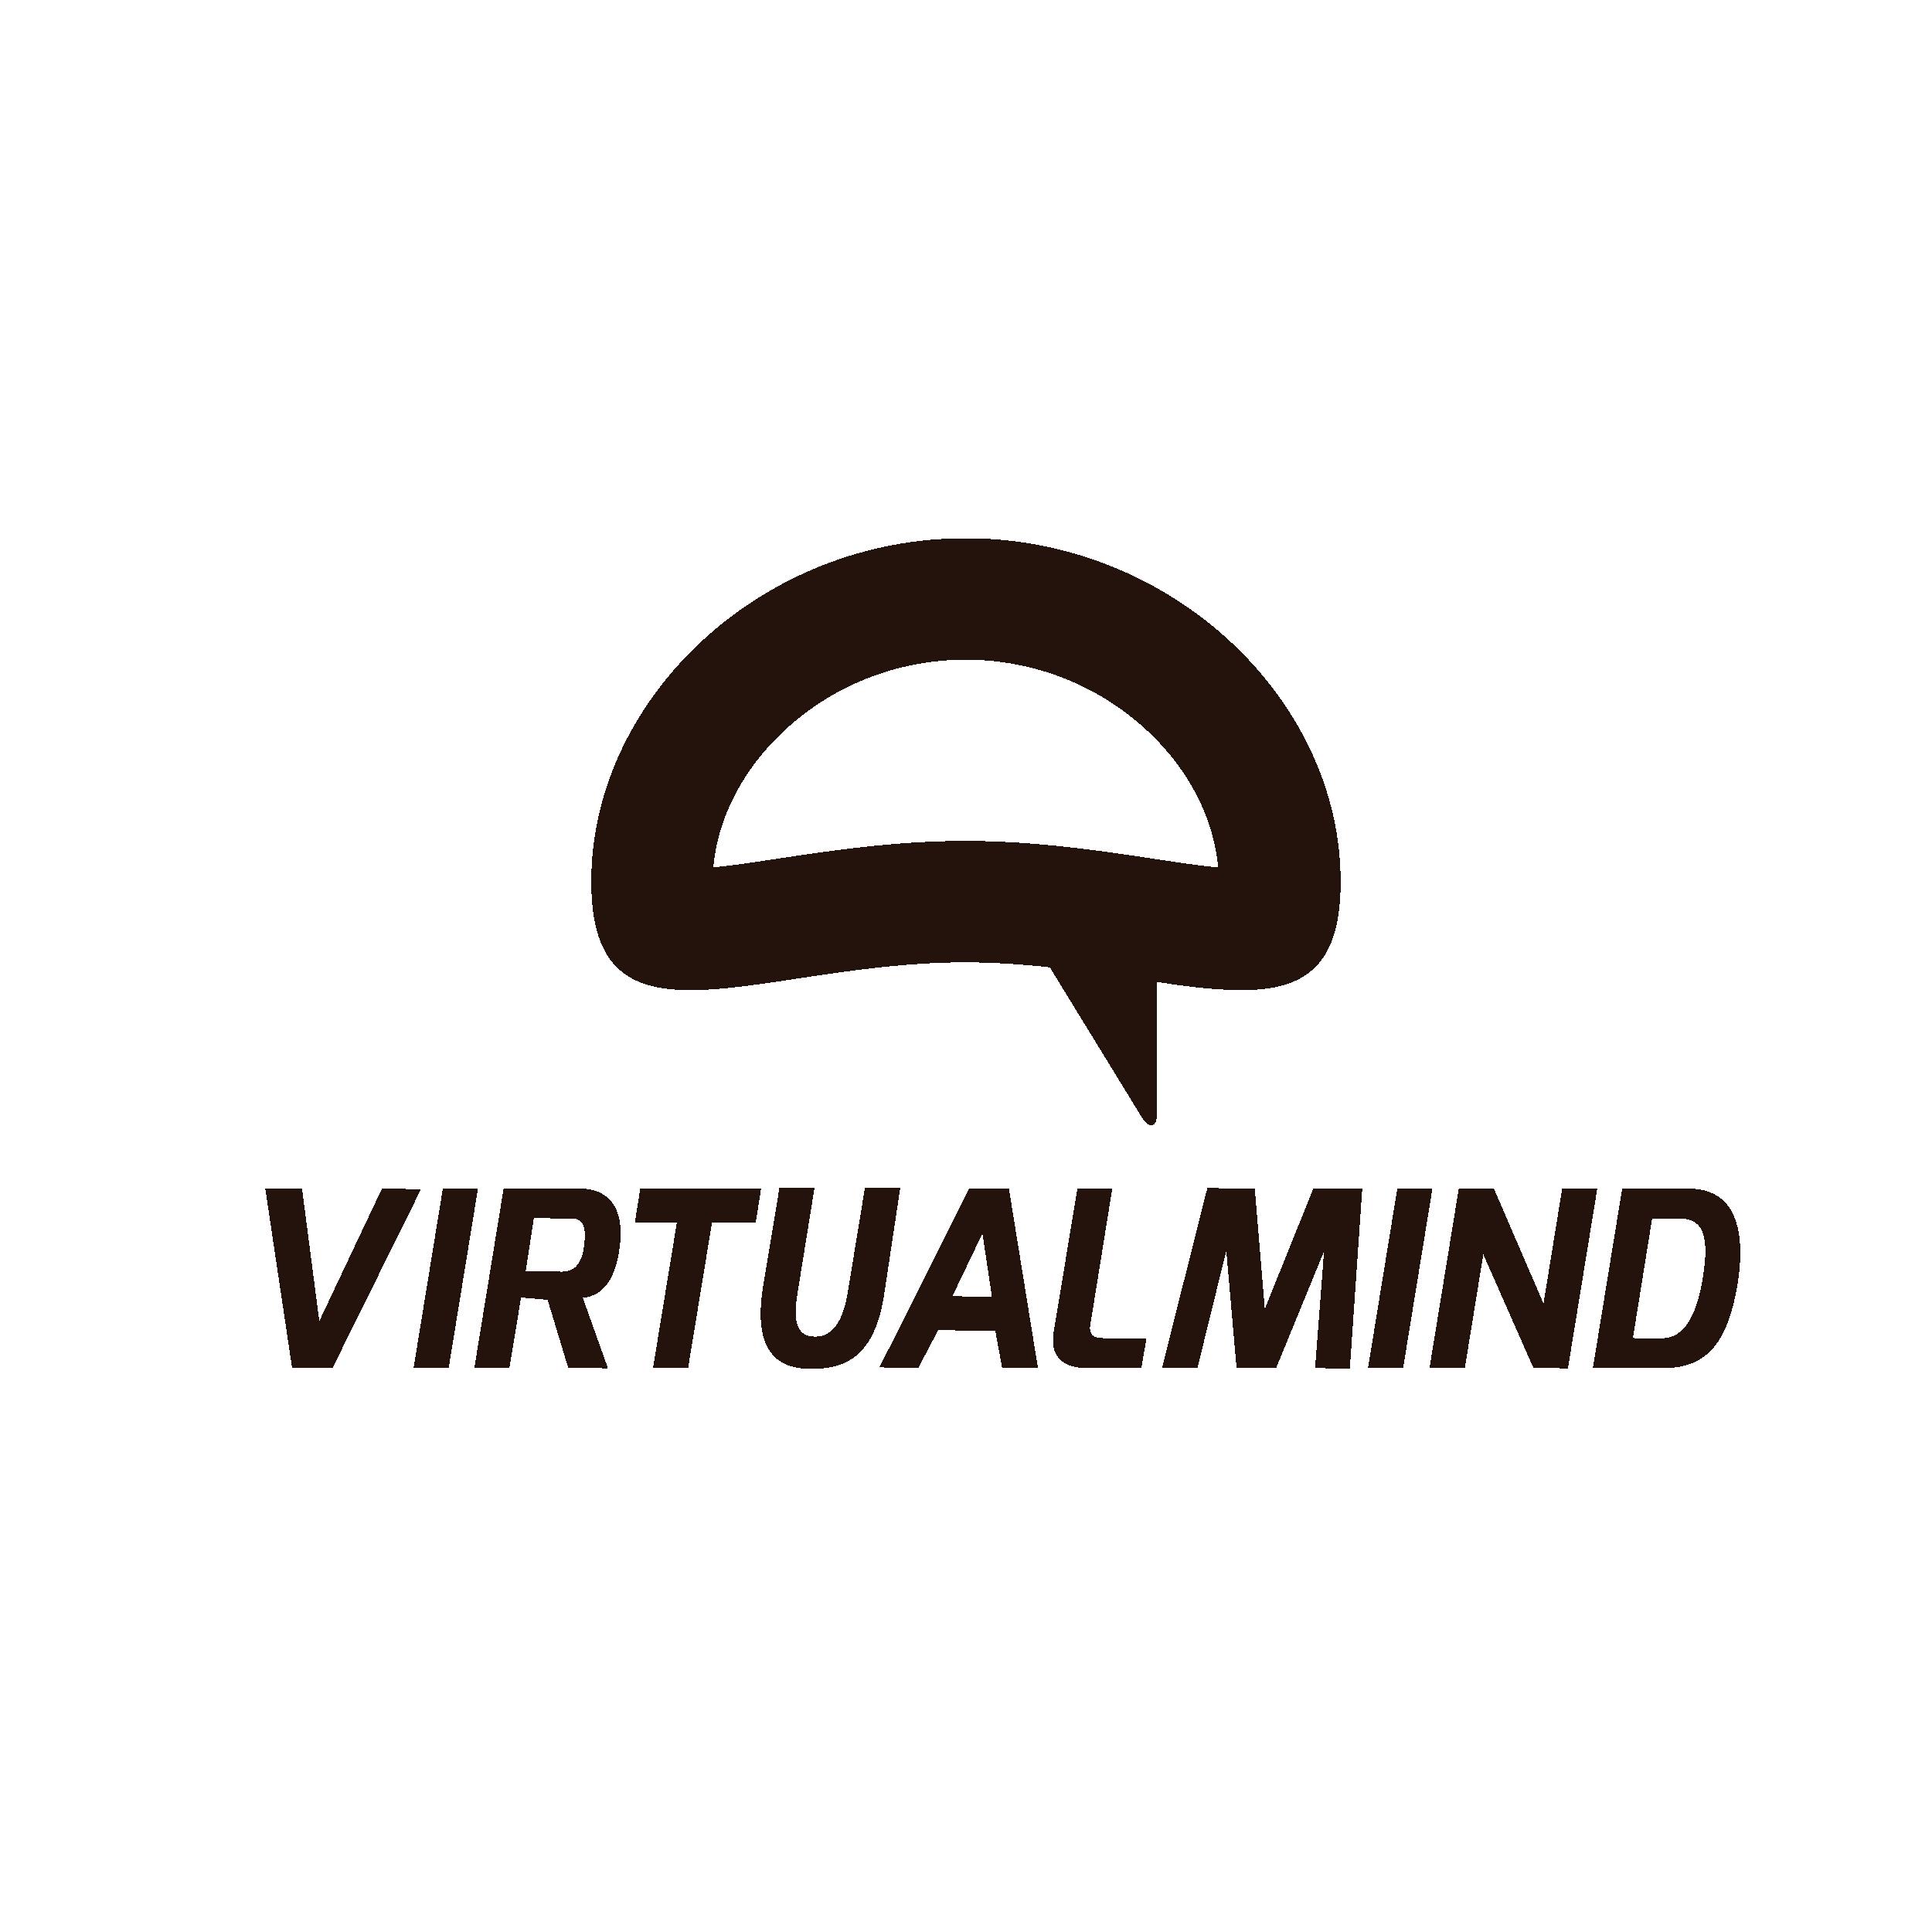 Virtualmind: Company's Logo